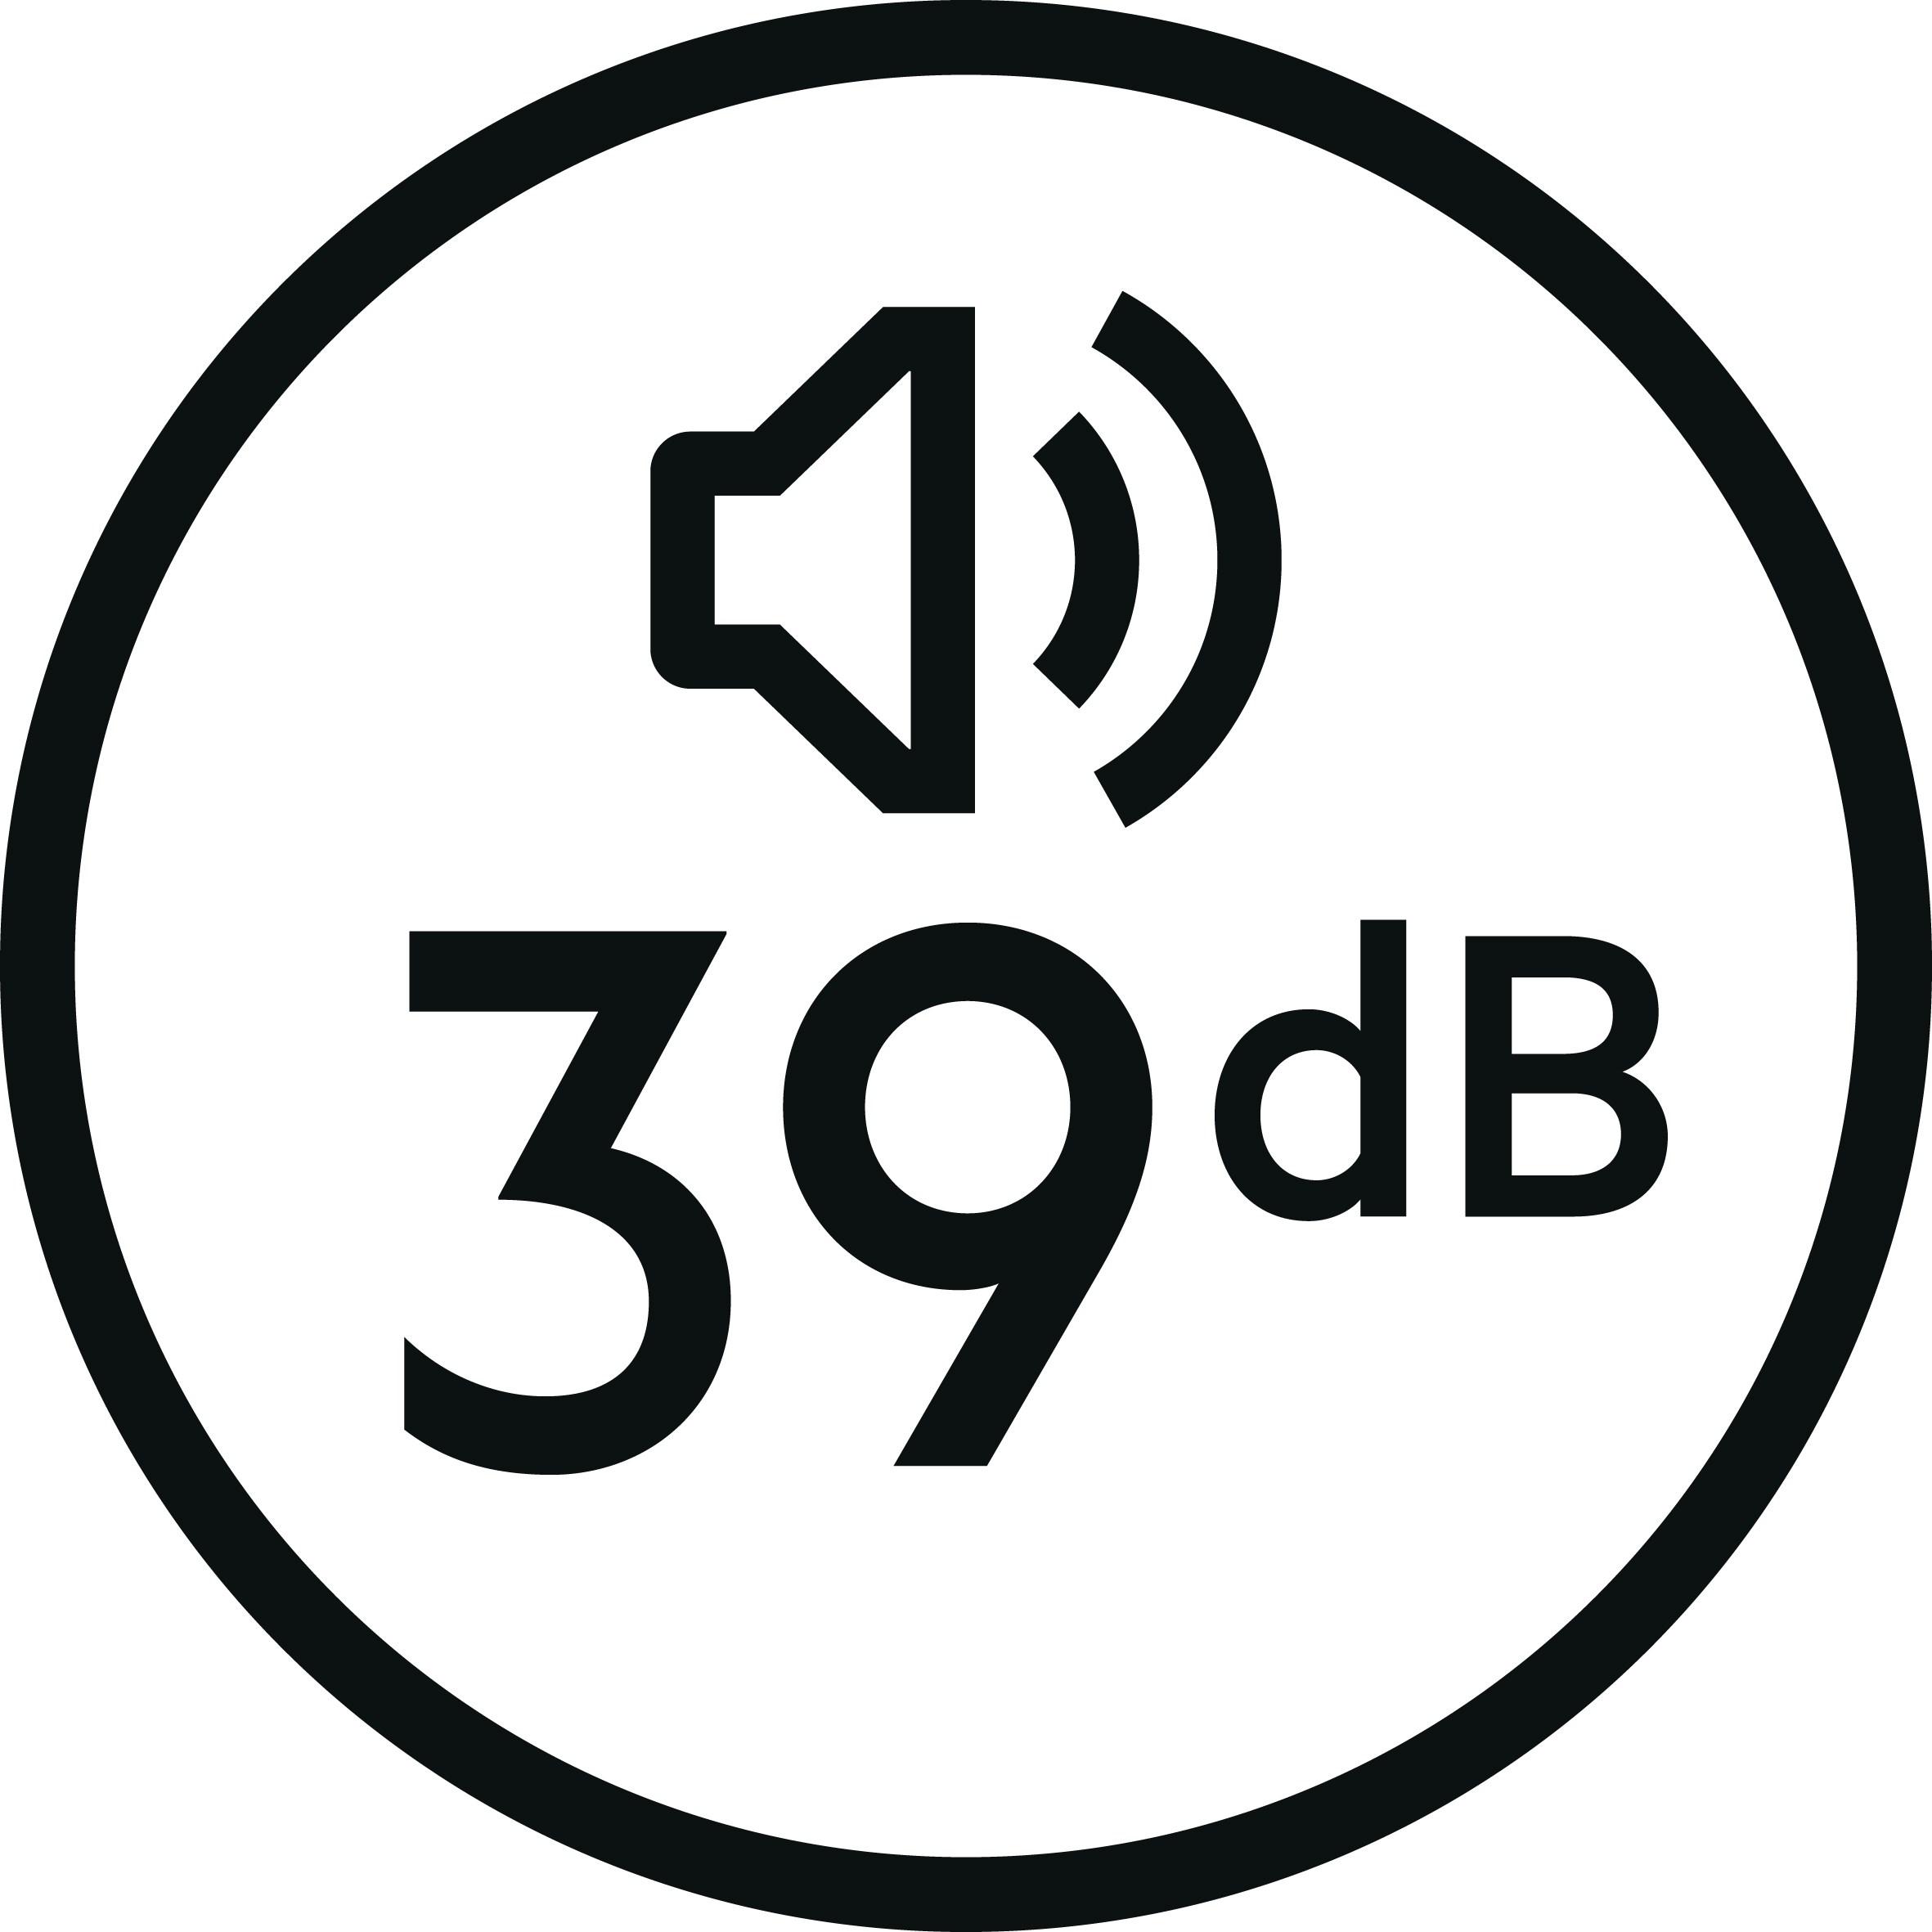 39dB-PSAAAP16PC569052.jpg